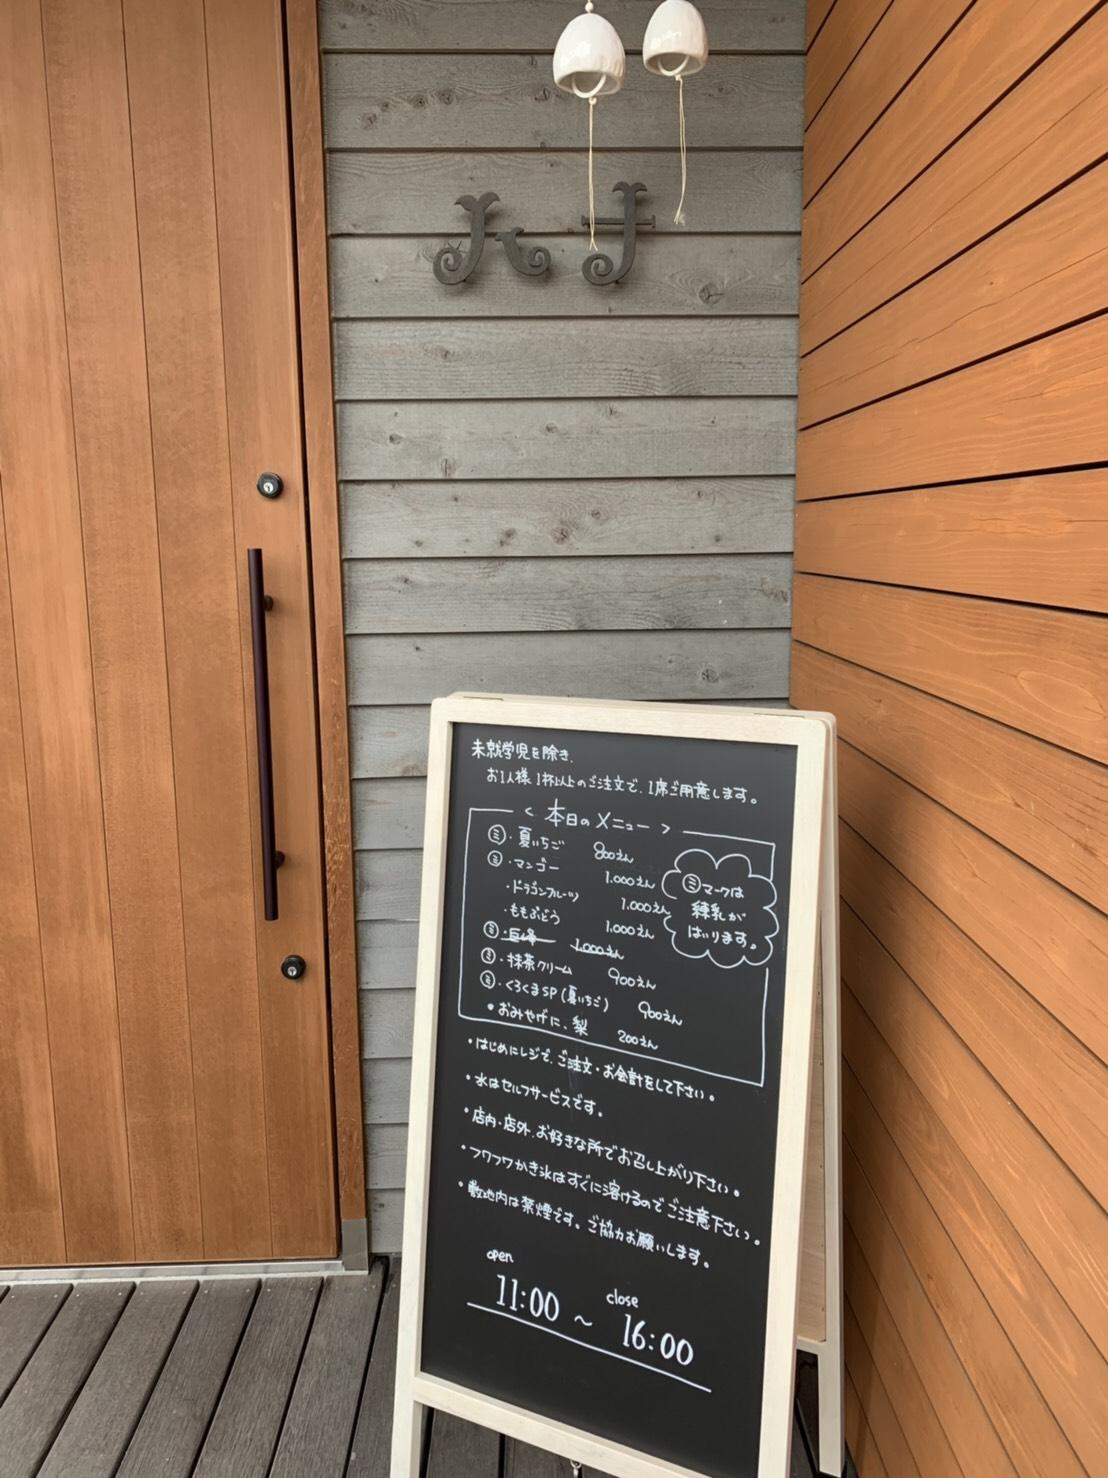 https://n-ko.jp/staffblog/hn-190829-1.jpg